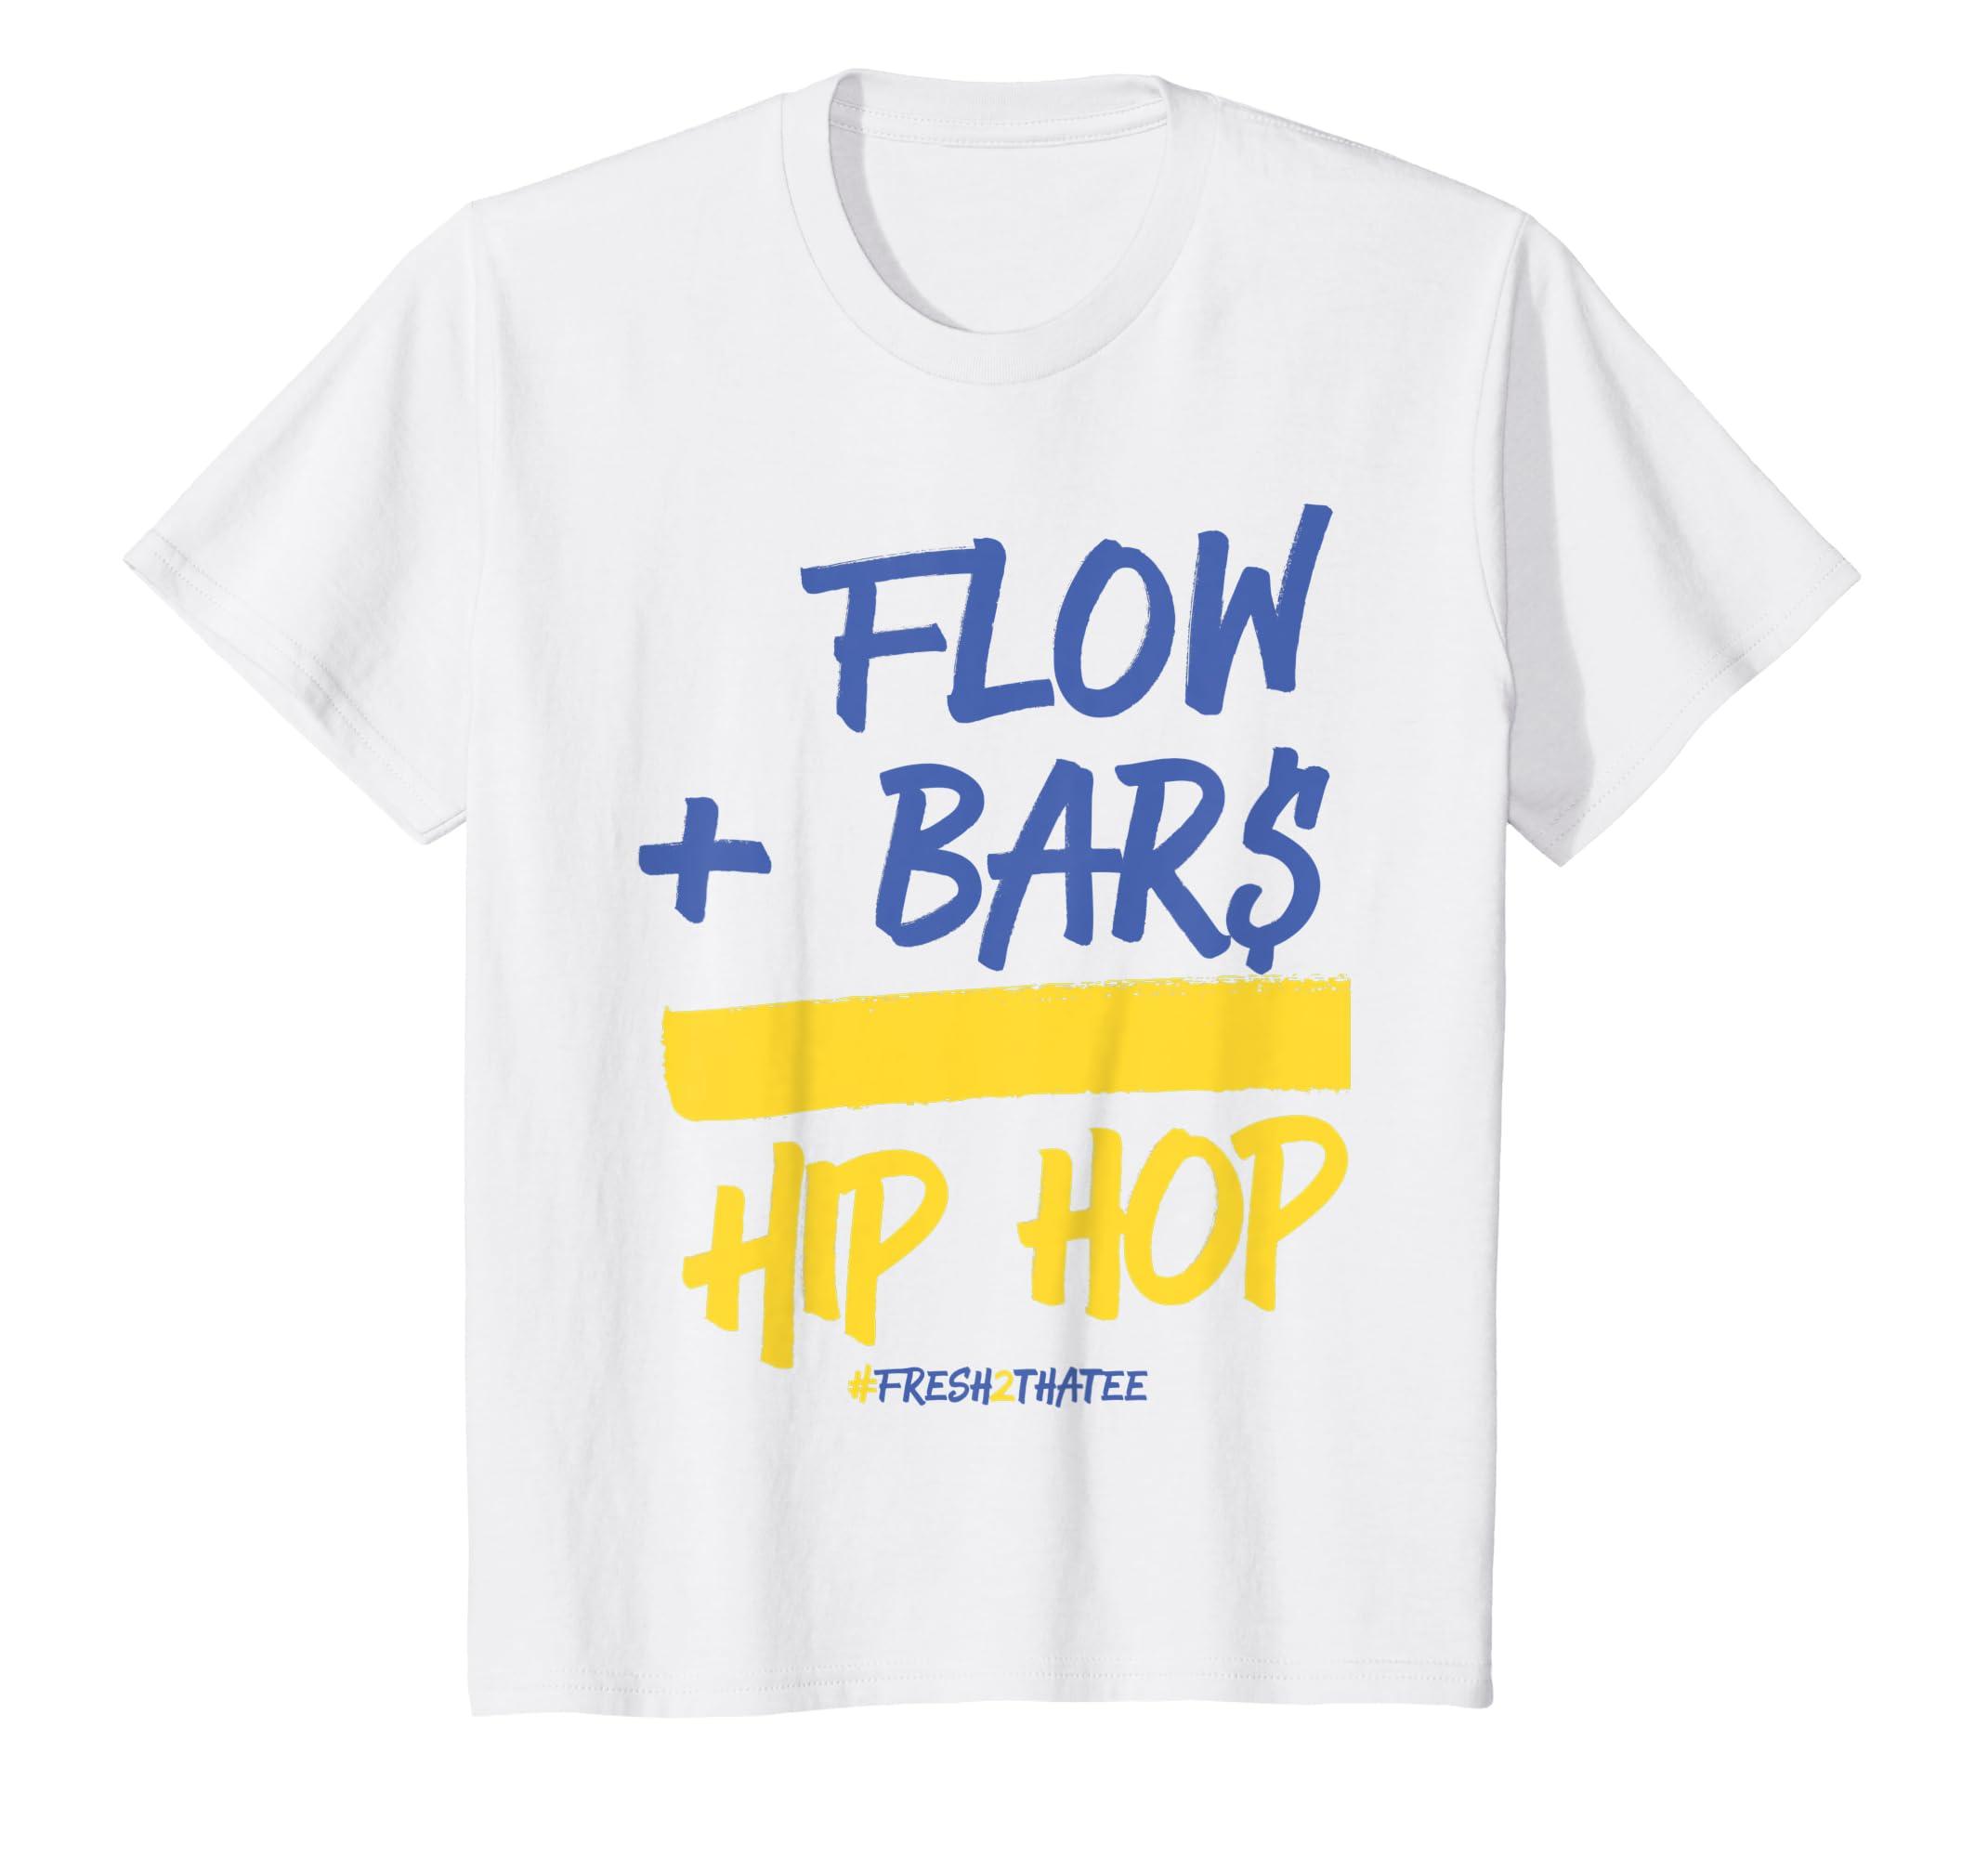 e7340ad2666020 Amazon.com  Hip hop shirt made to match Jordan 5 jsp laney  Clothing